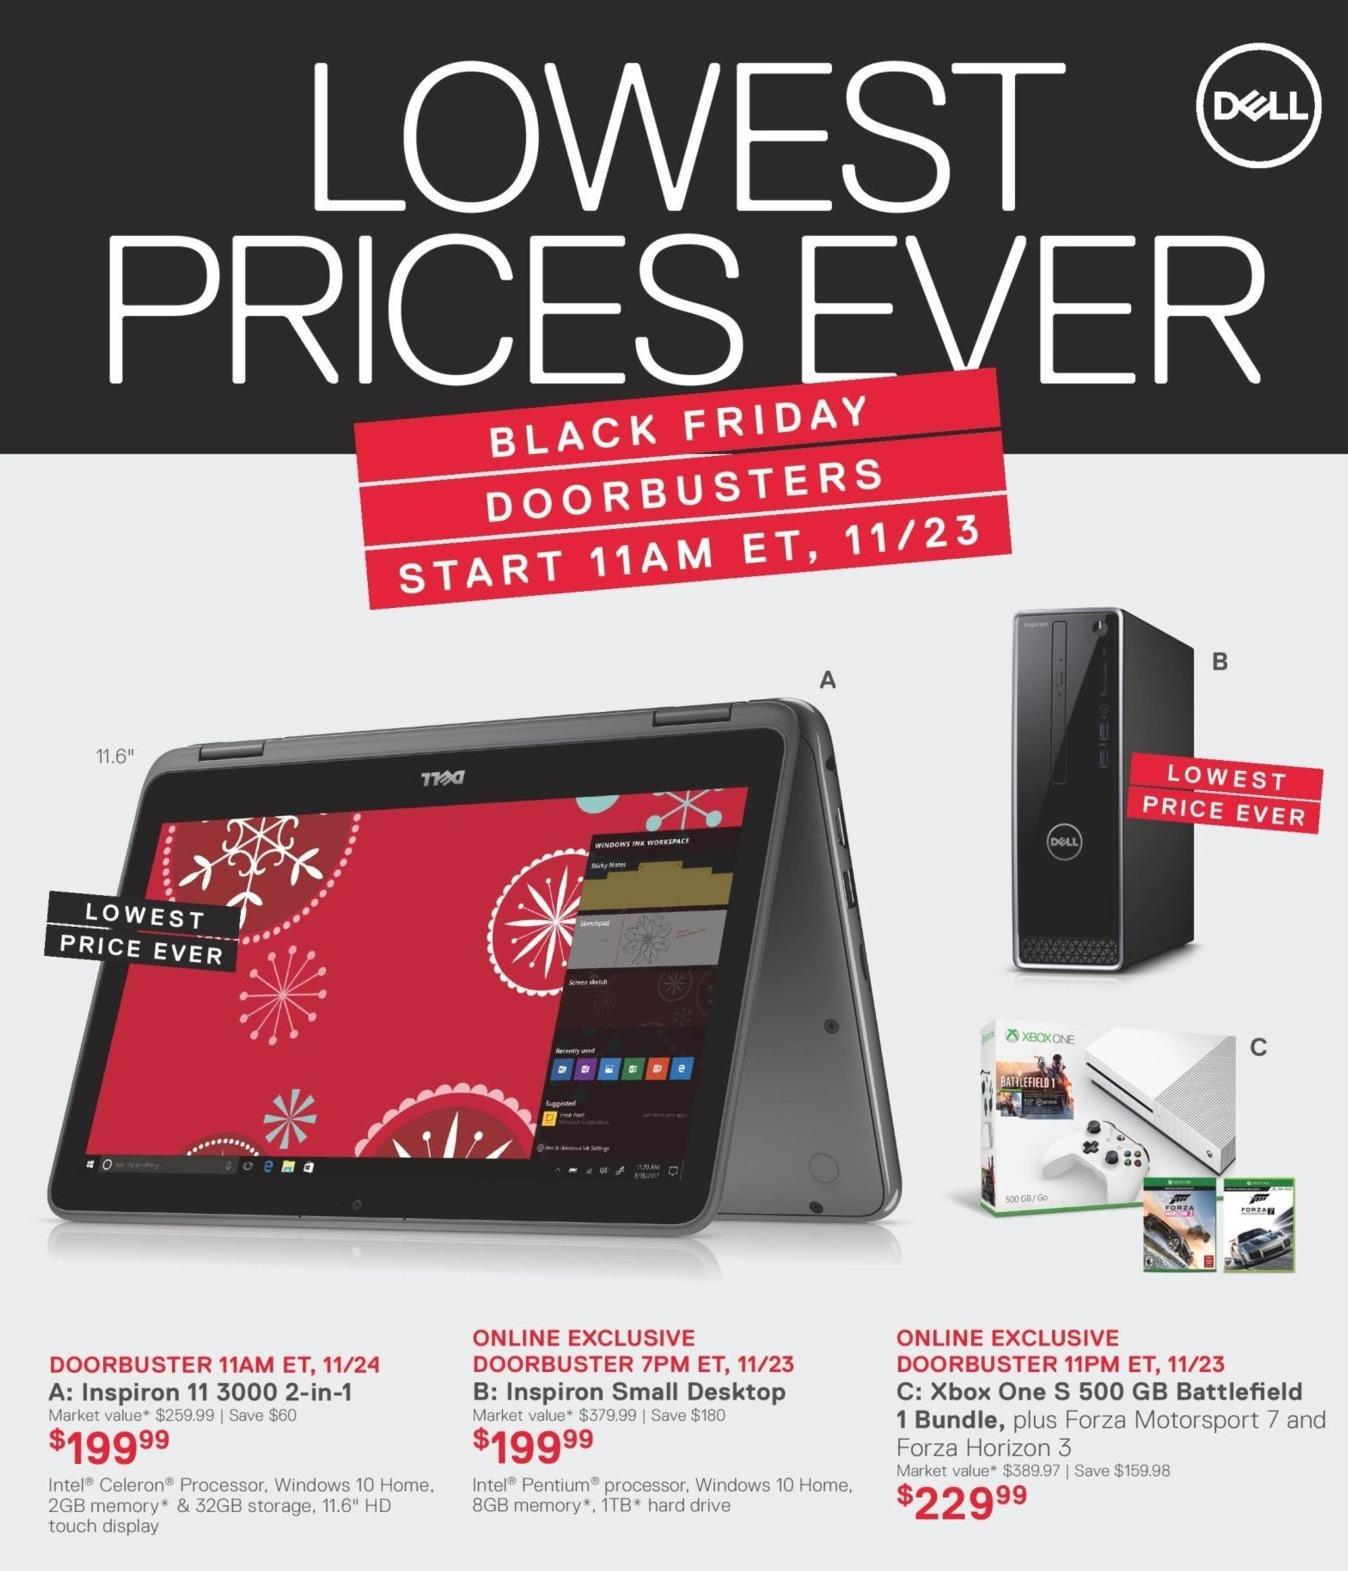 Dell Home & Office Black Friday: Dell Inspiron Small Desktop, Intel Pentium CPU, 8GB RAM, 1TB HDD & Win 10 for $199.99